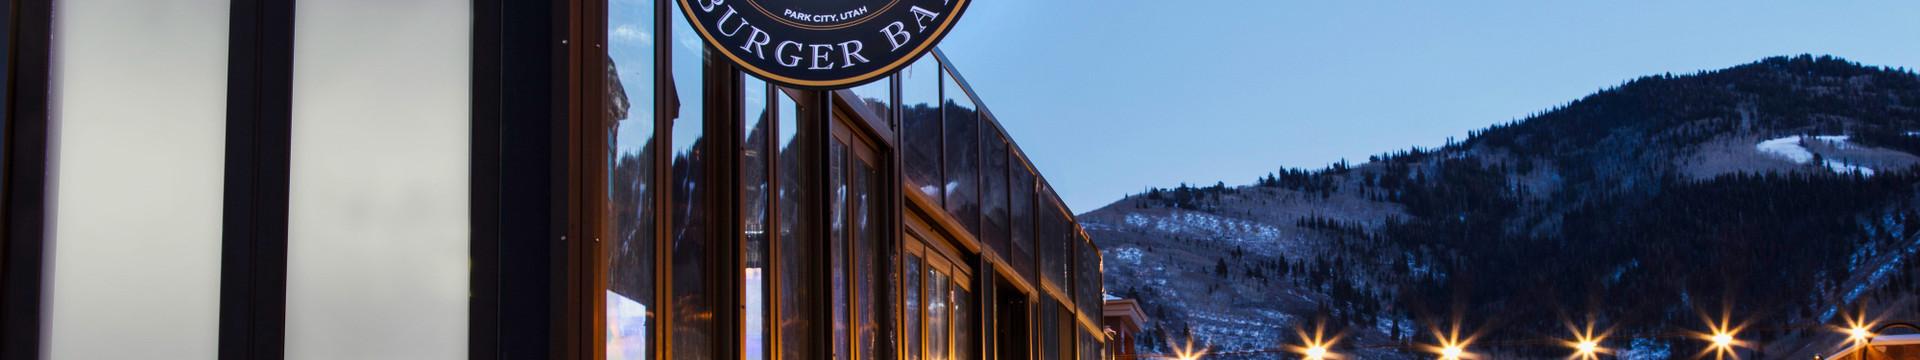 Outside the best burger bar in Park City | Menu For Drafts Burger Bar Park City | Westgate Park City Resort & Spa